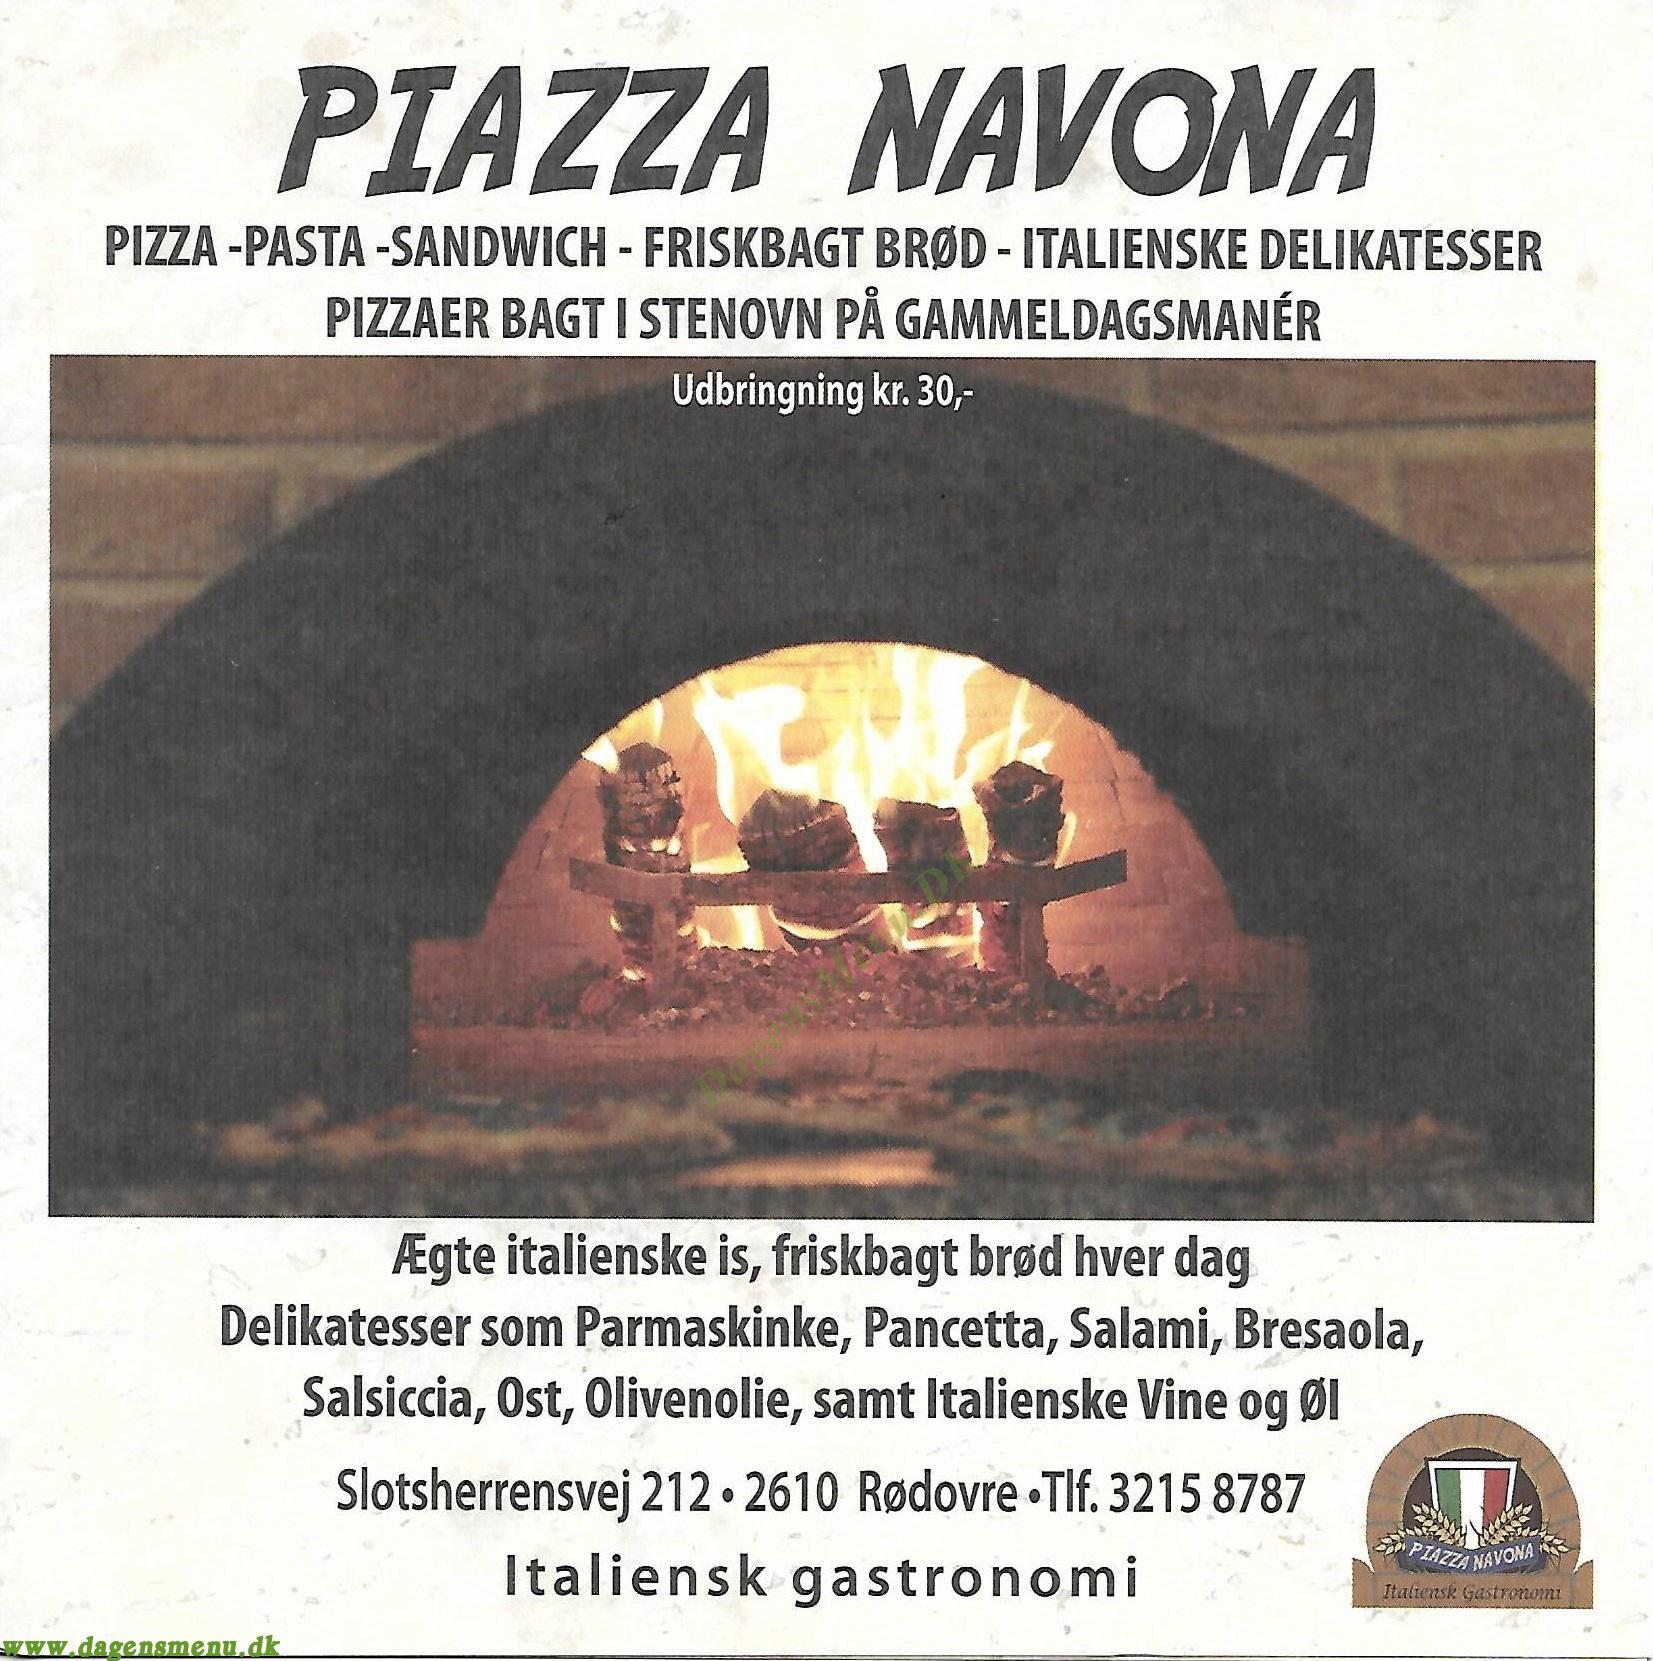 Piazza Navona - Menukort